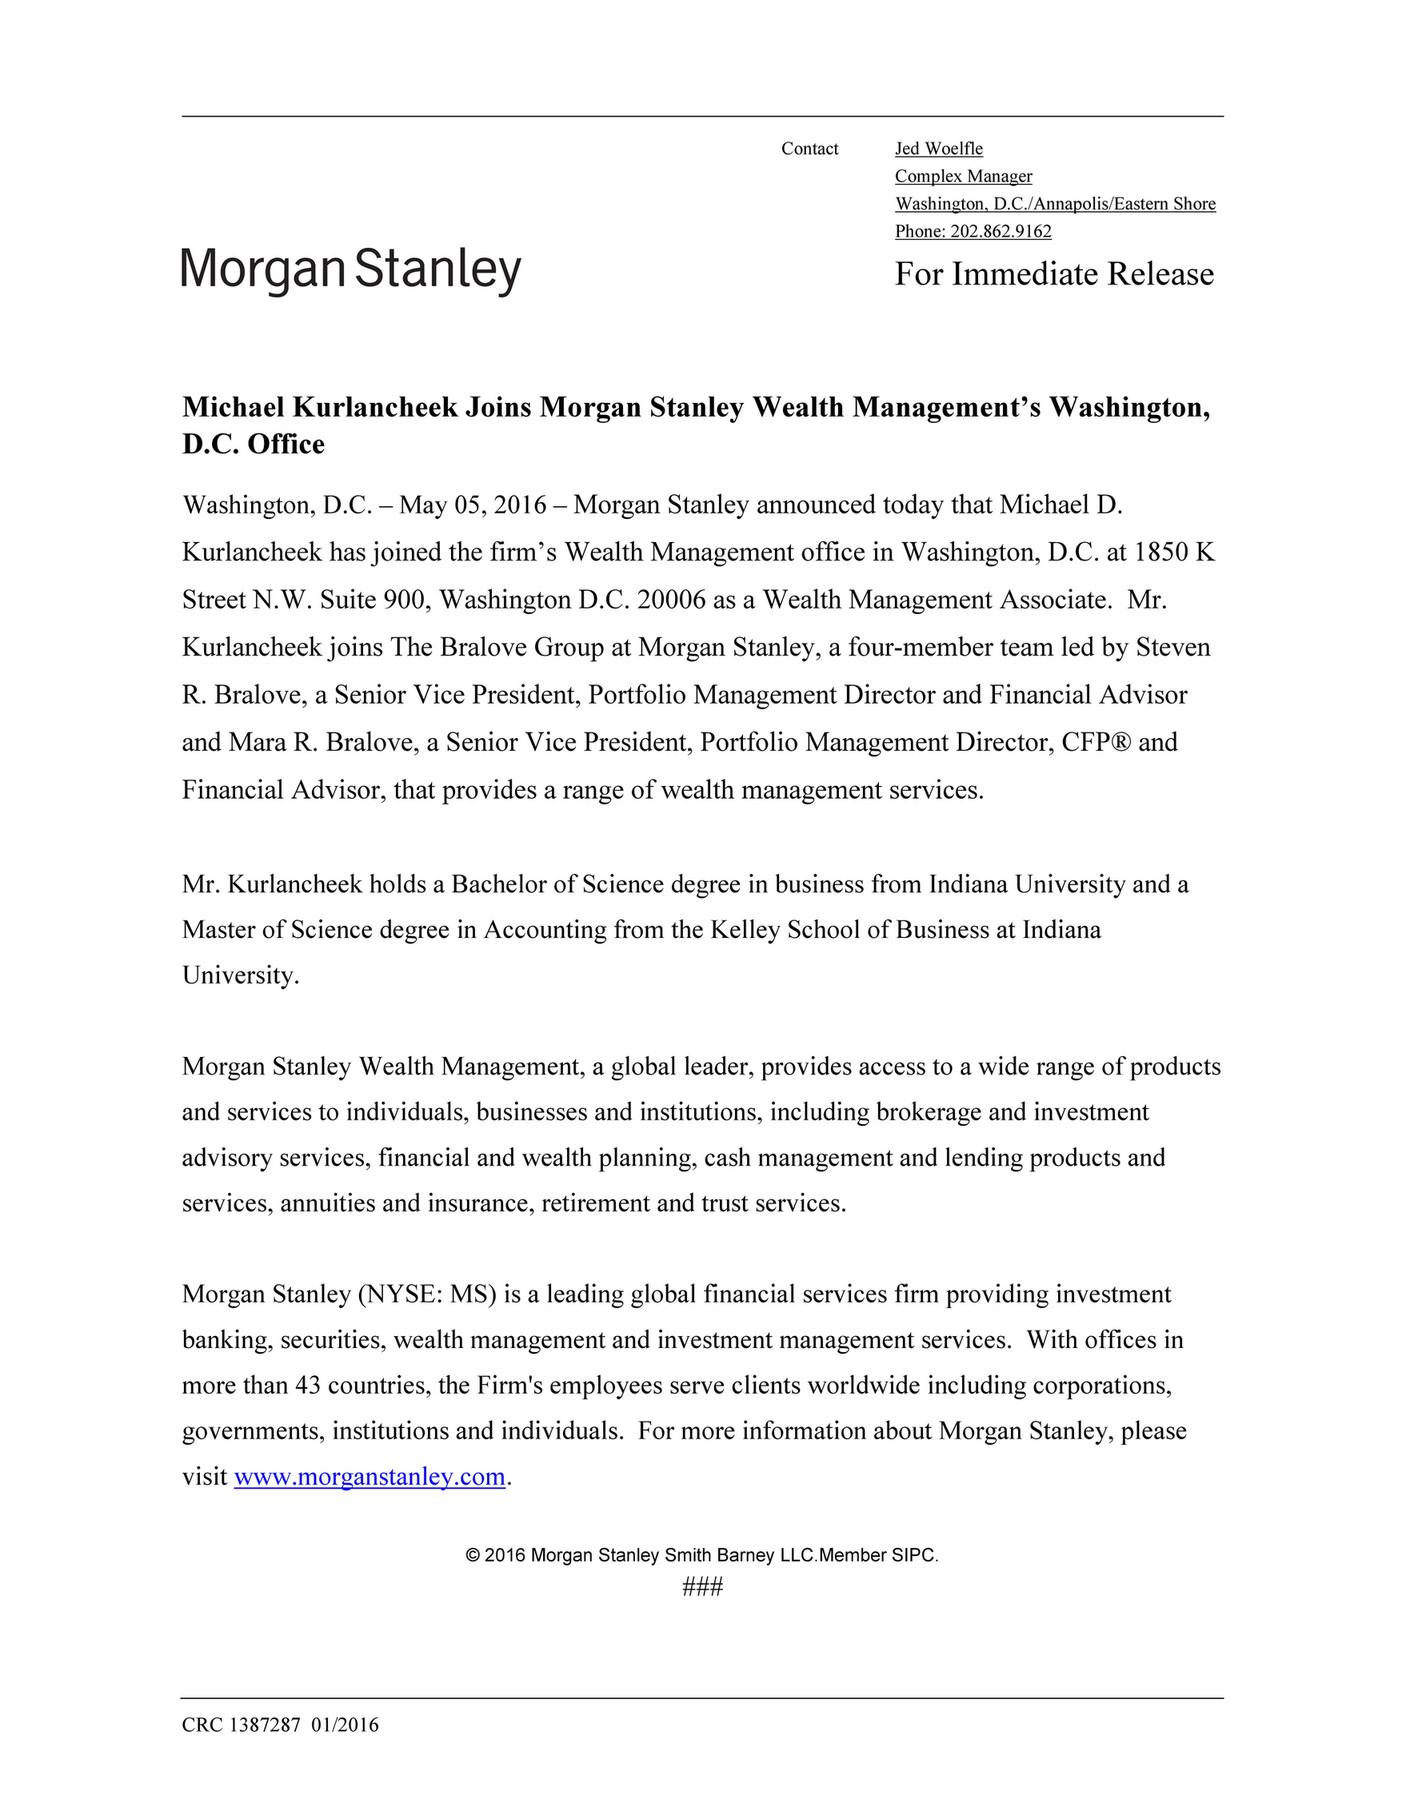 bob boberts - Michael Kurlancheek Joins Morgan Stanley